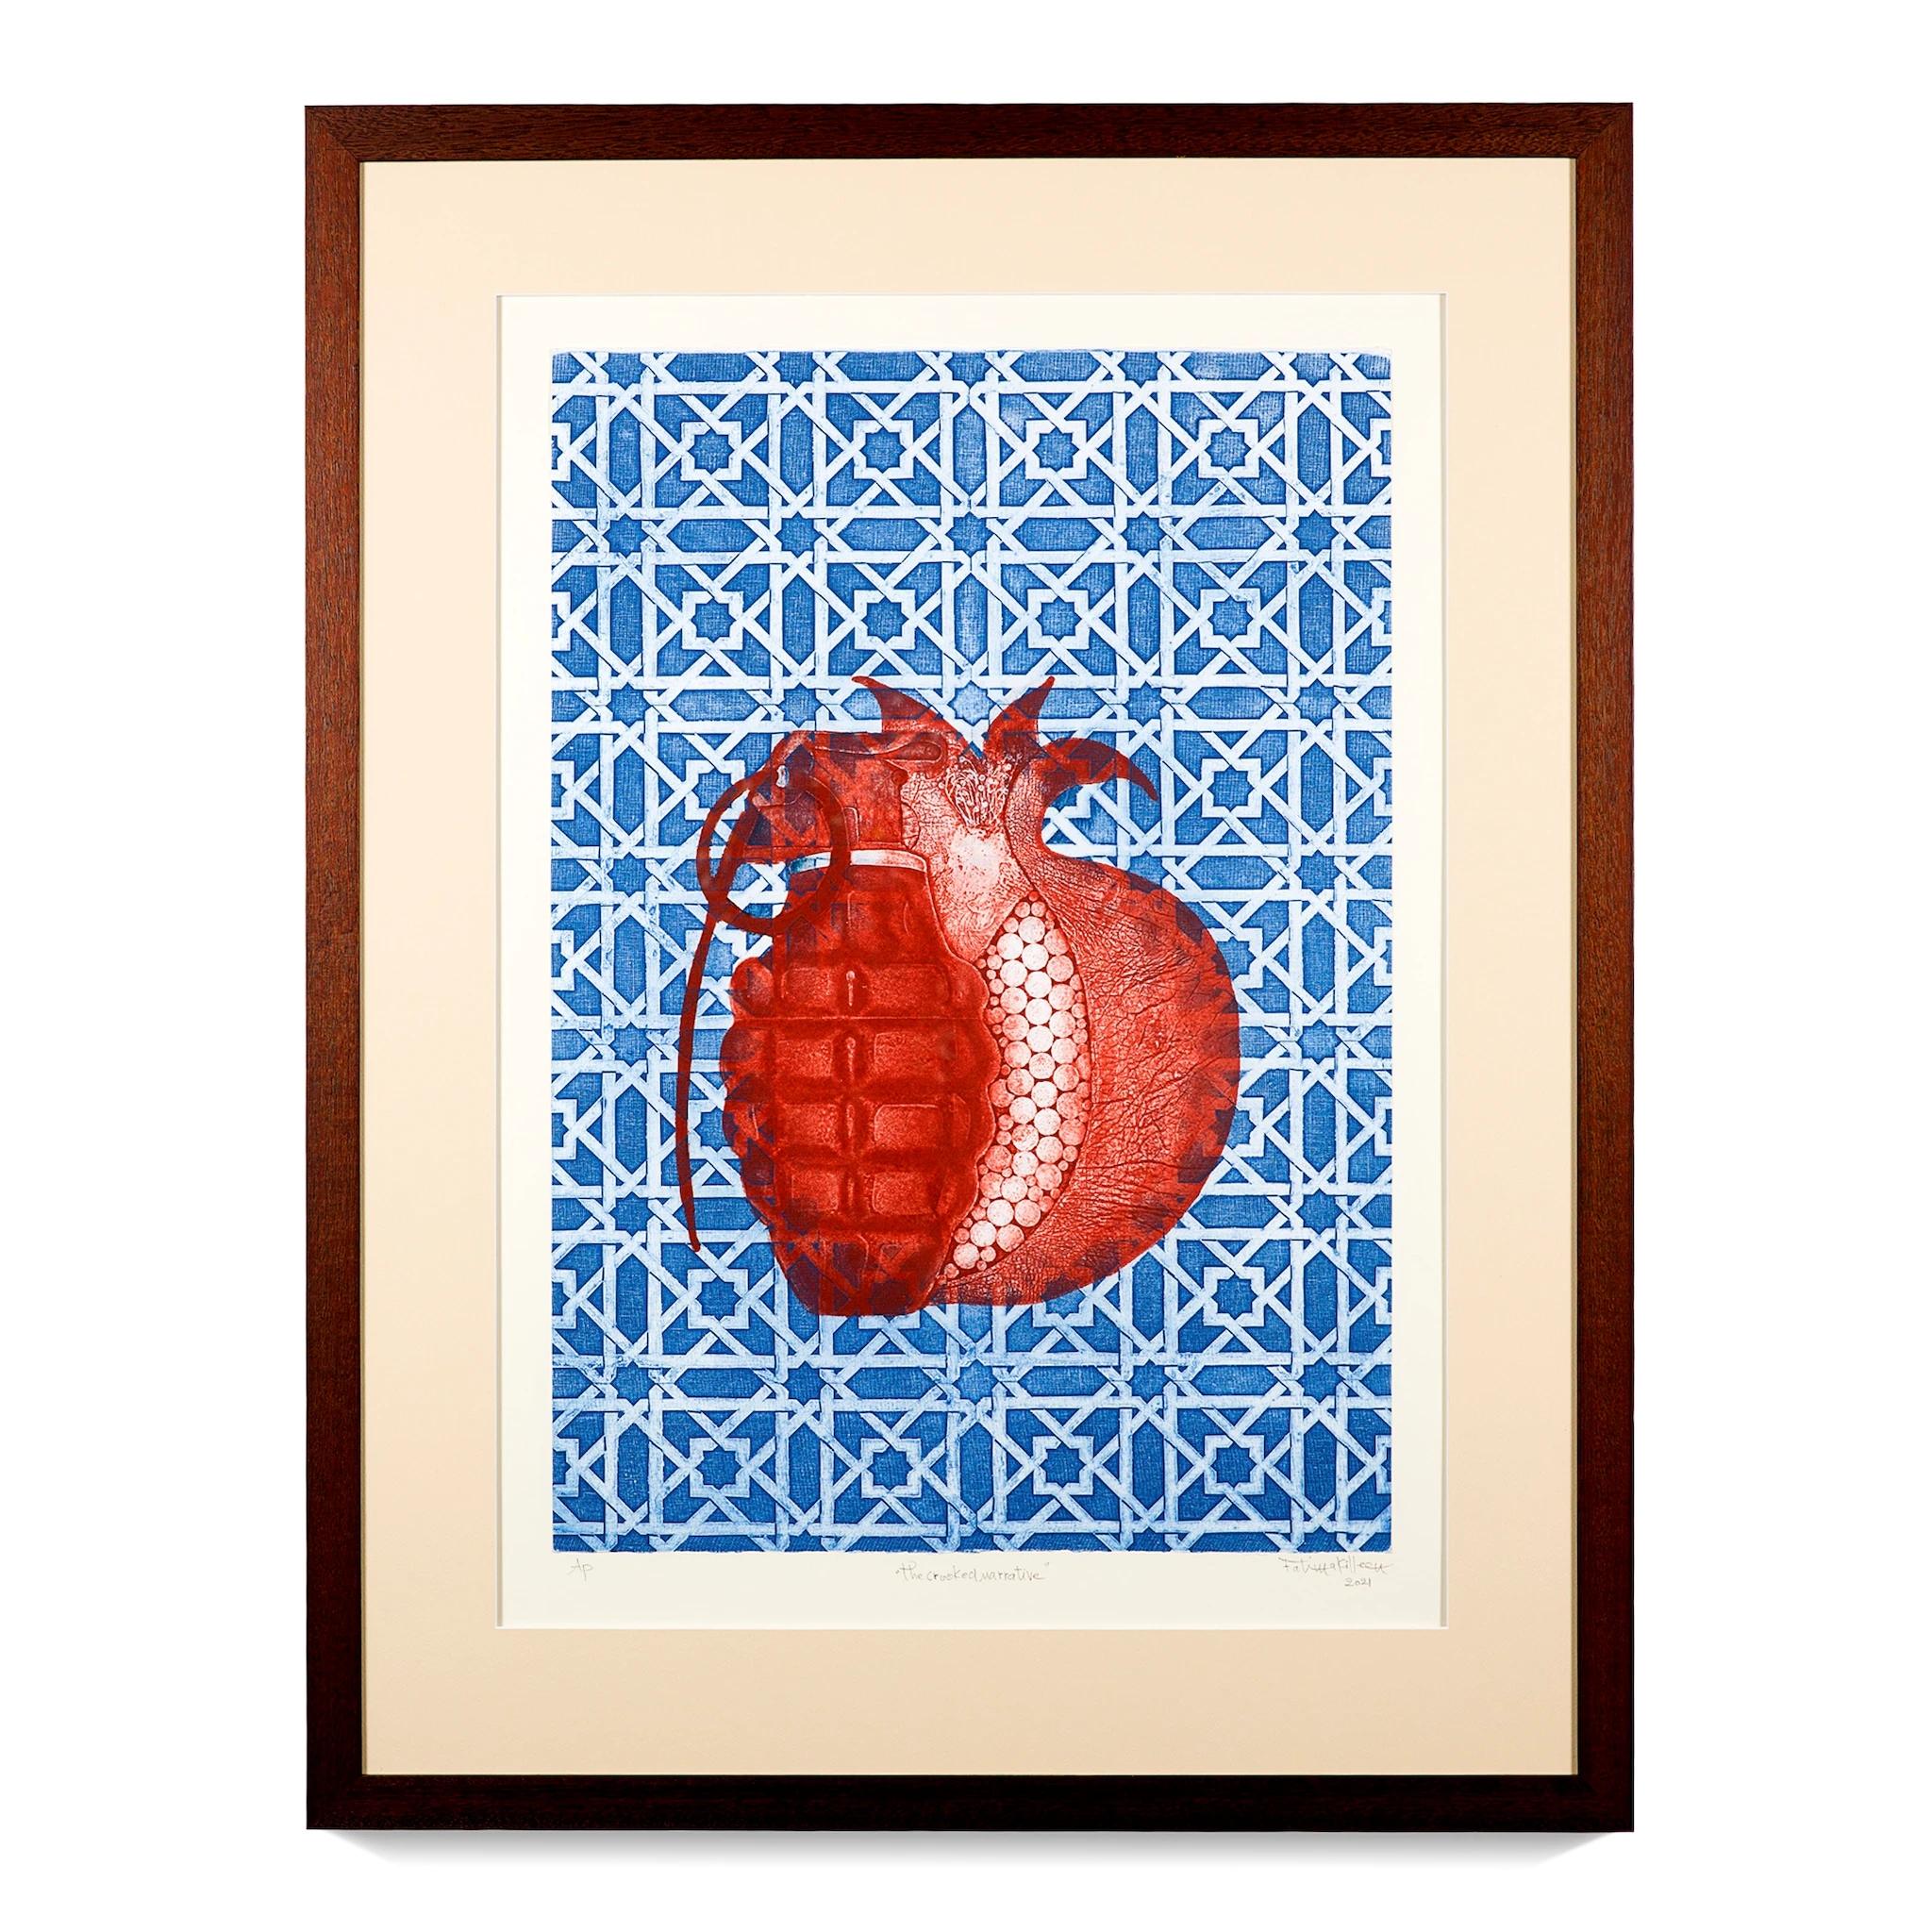 The Cooked Narrative (2021) - Fatima Killeen - www.fatimakilleen.com - collograph - Australian Muslim Artists Art prize 2021